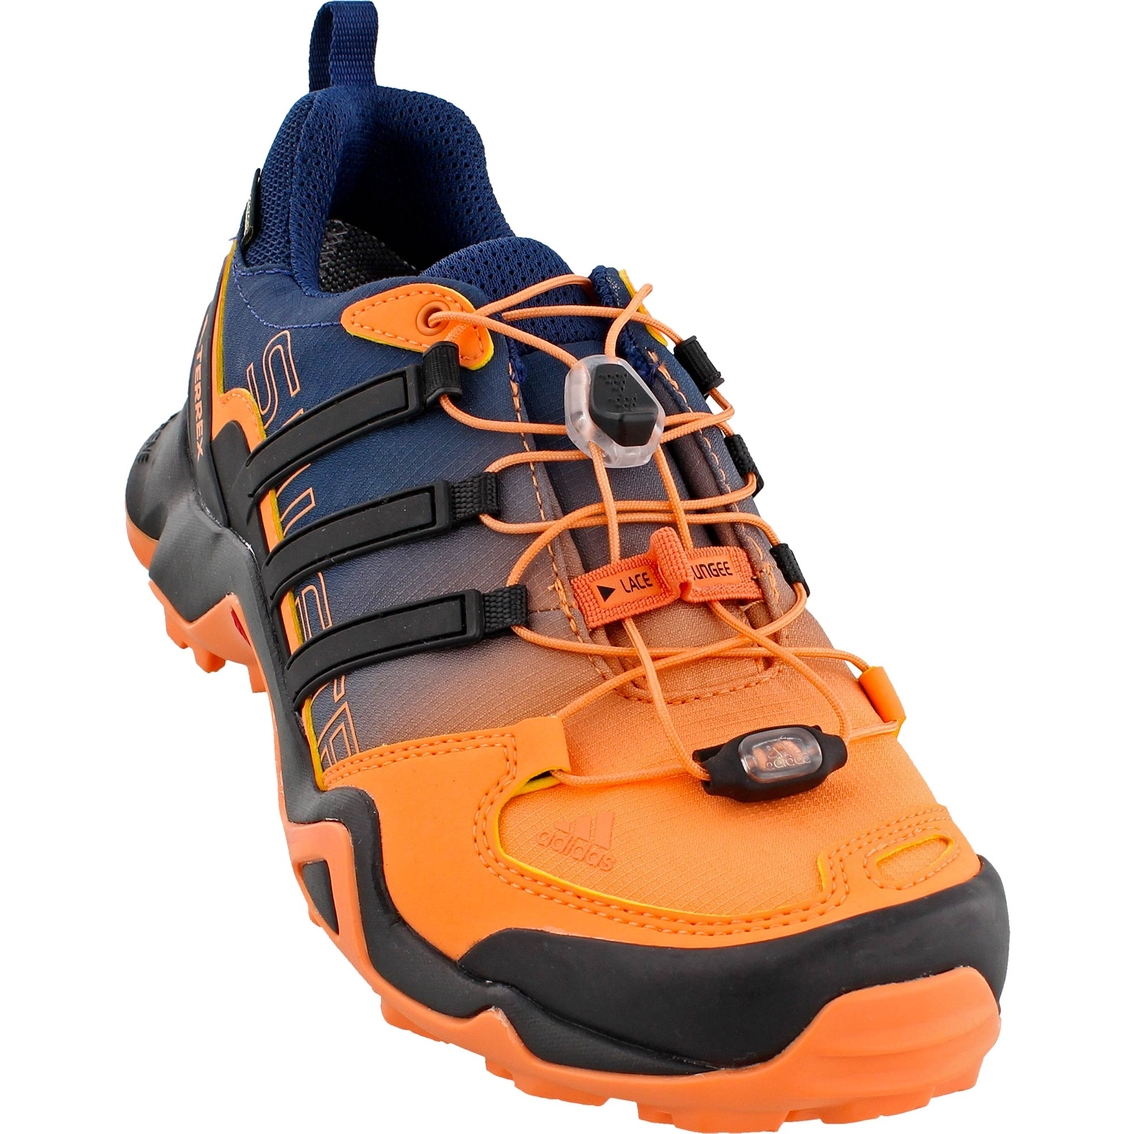 Adidas Outdoor Women's Terrex Swift R Gtx Shoes | Hiking & Trail ...